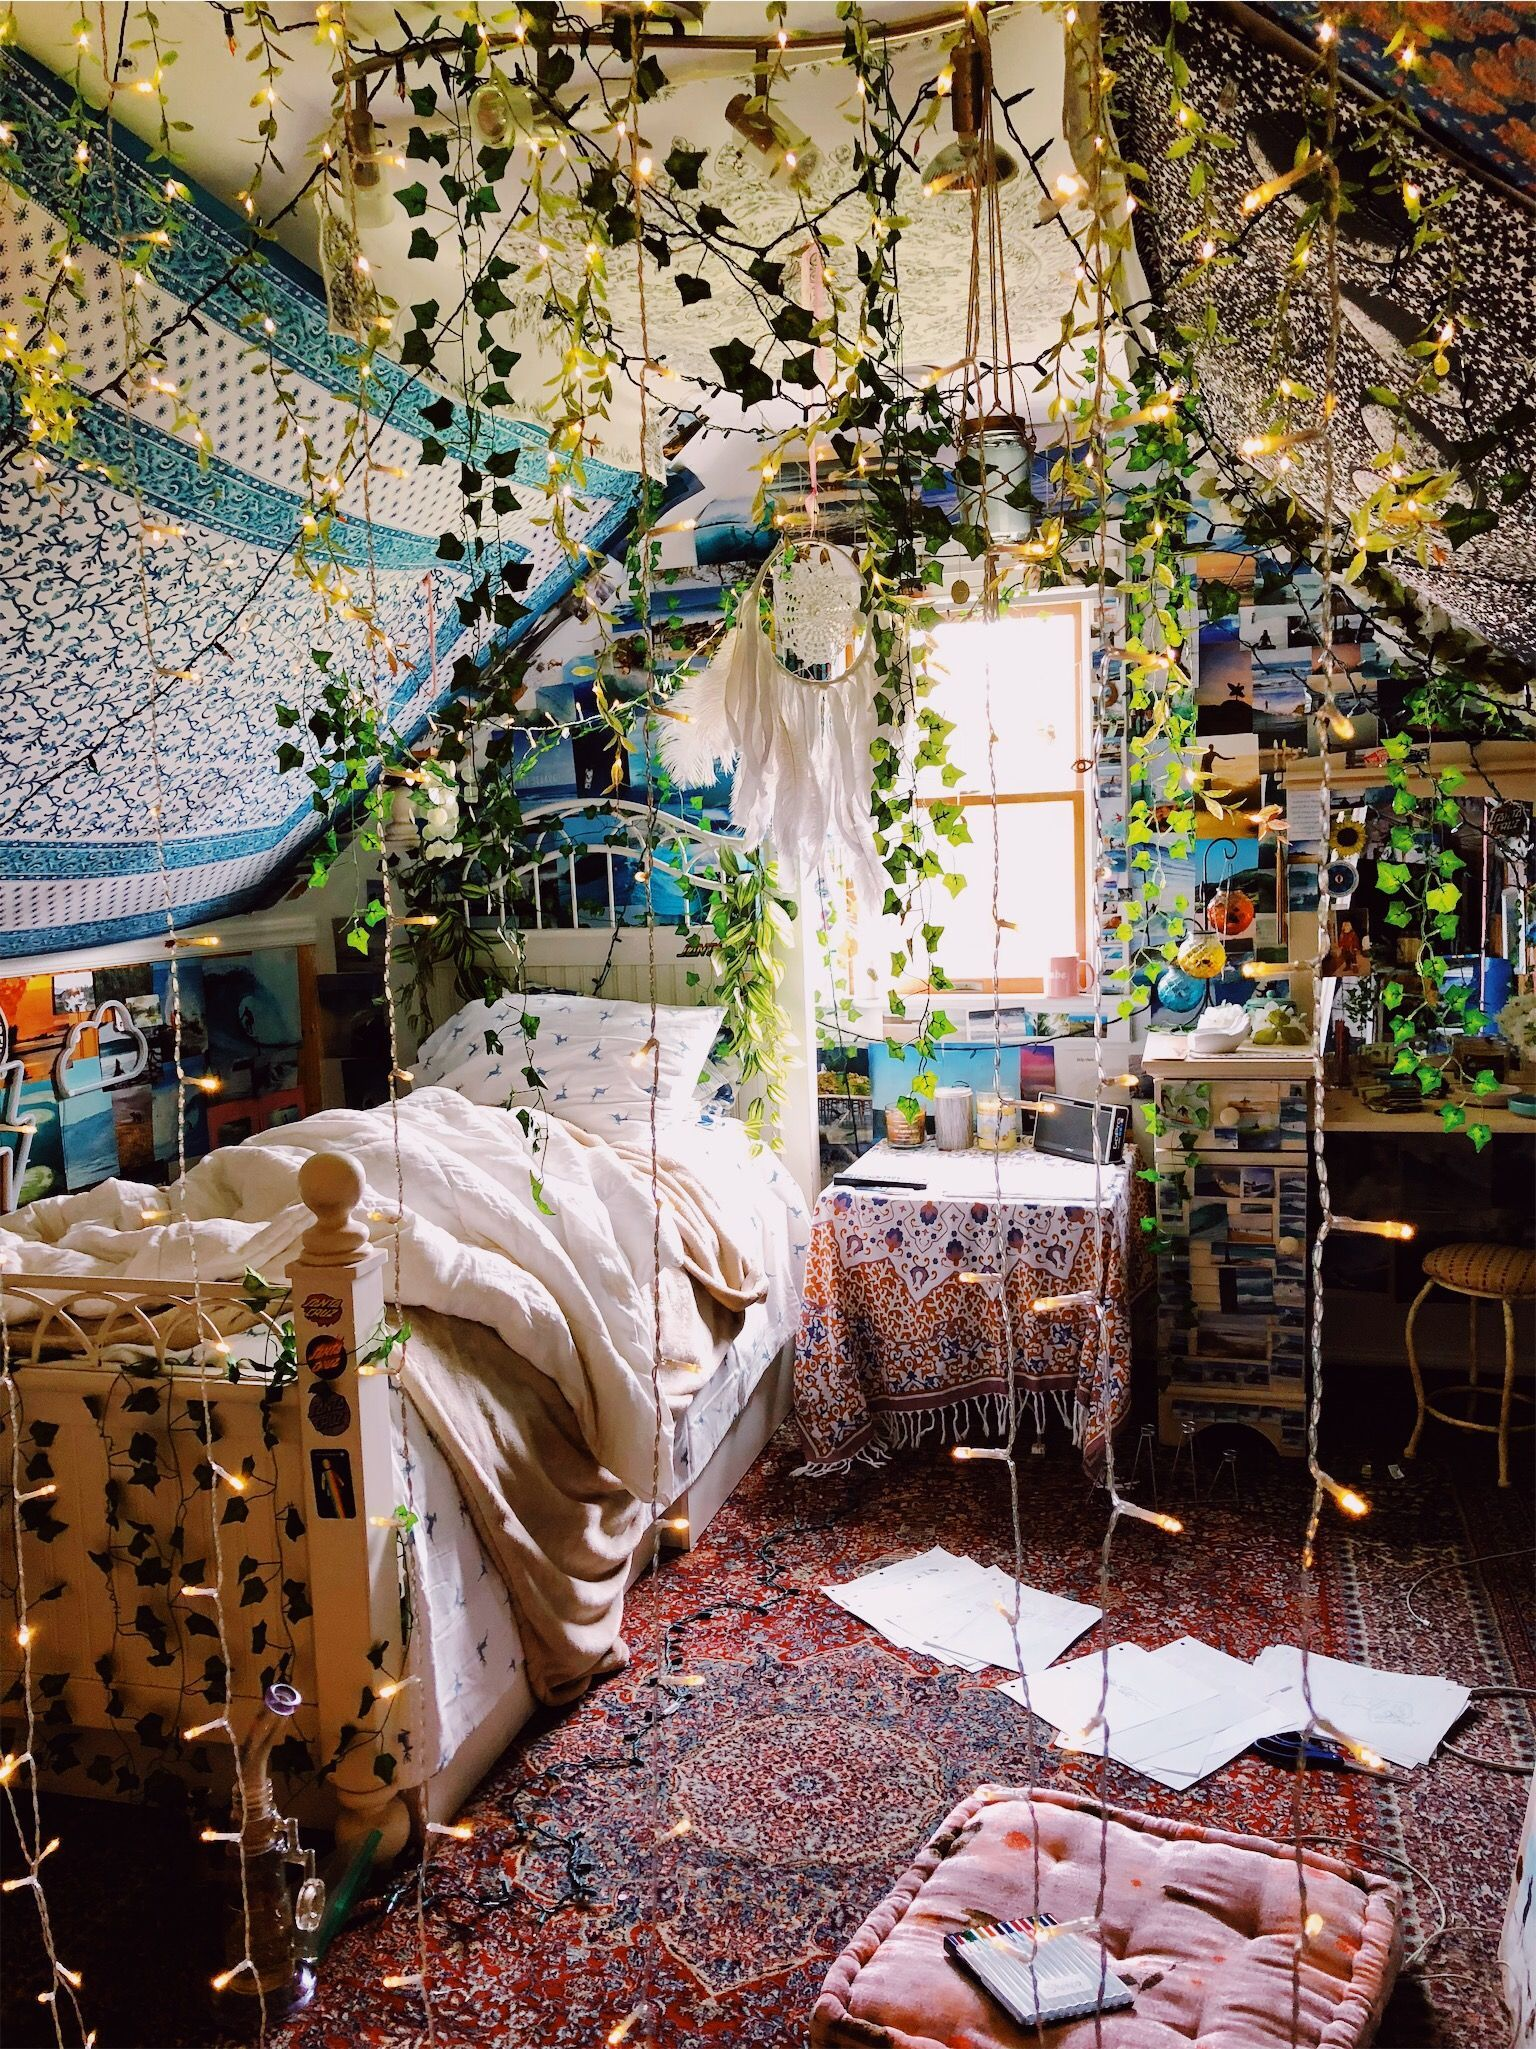 Good Pictures Carpet Bedroom Aesthetic Tips Your Bedroom Flooring Is Important It Is T In 2021 Bohemian Bedroom Decor Bohemian Bedroom Decor Hippie Room Ideas Bedroom